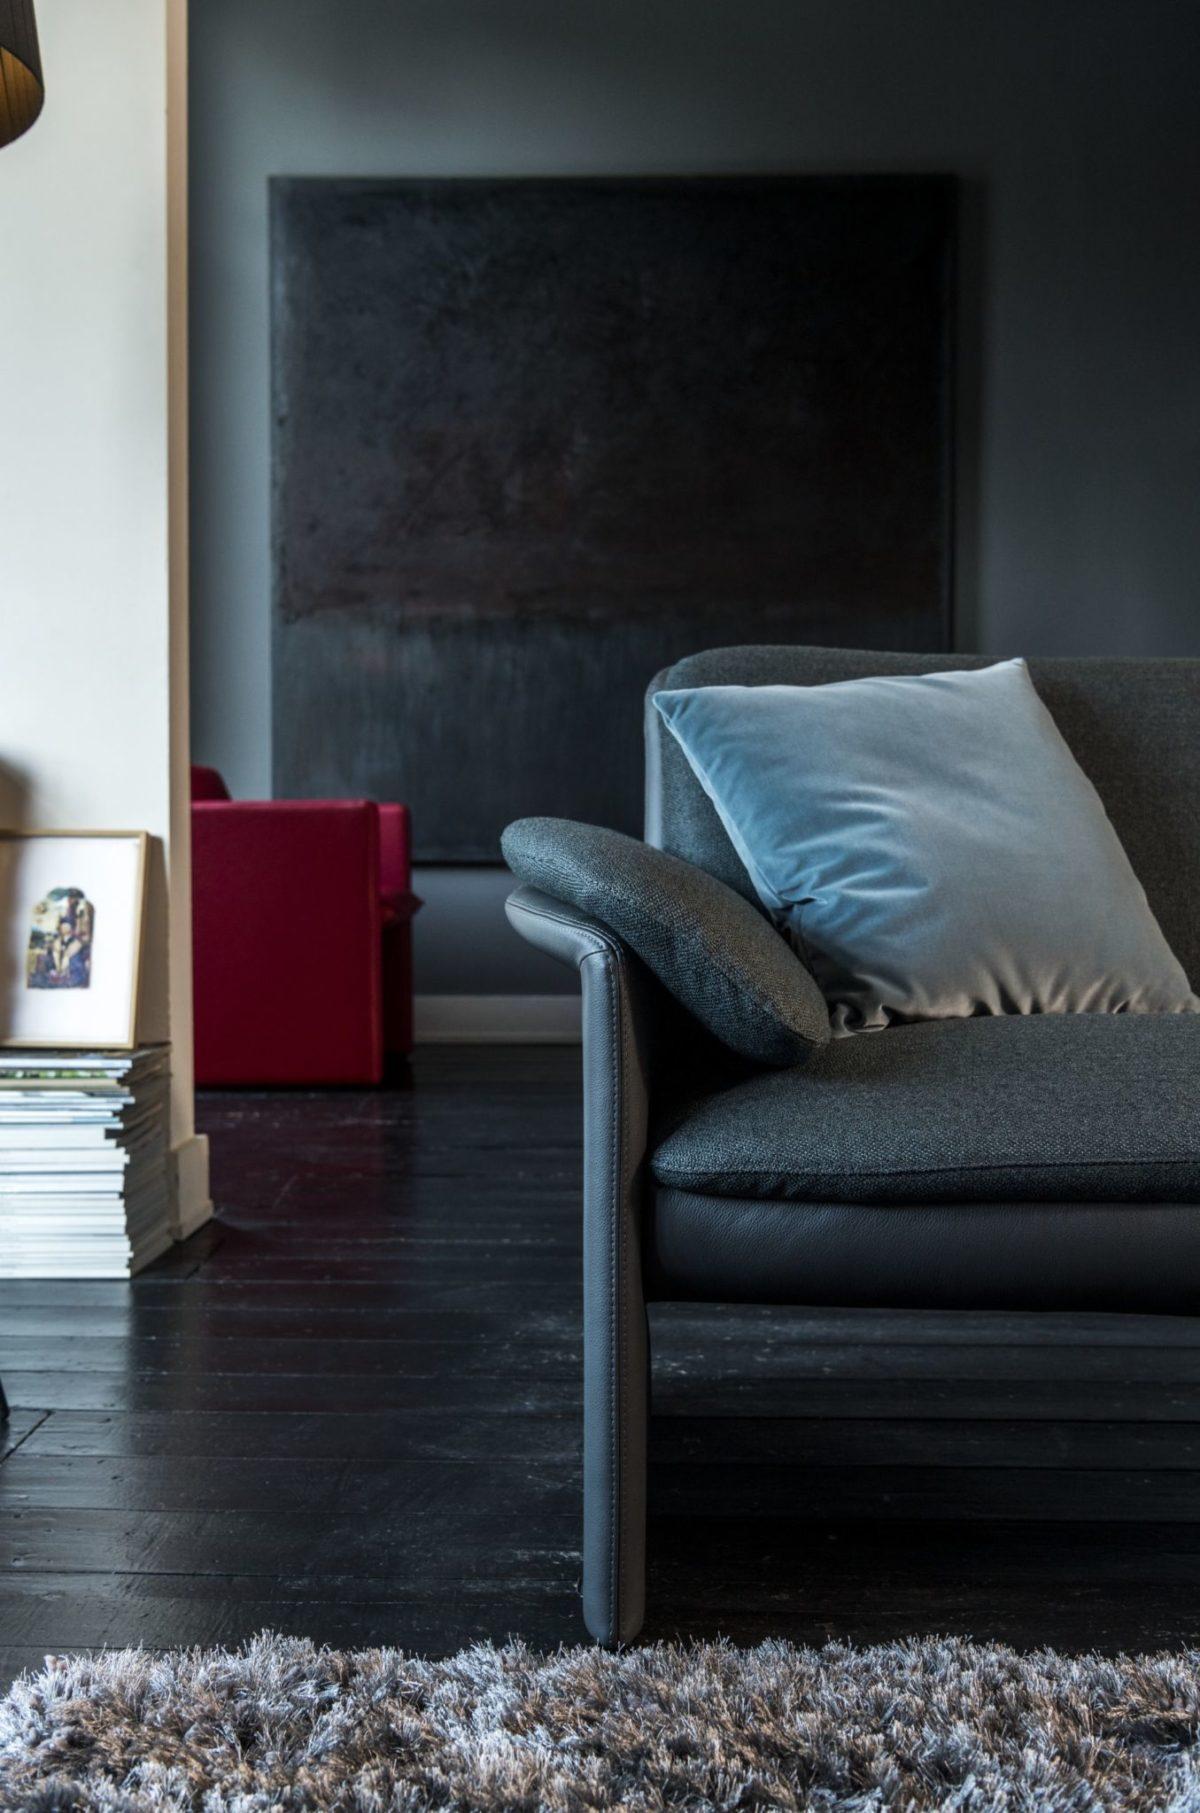 Évidence Catalpa Leolux sofa bankstel 2018 A 102